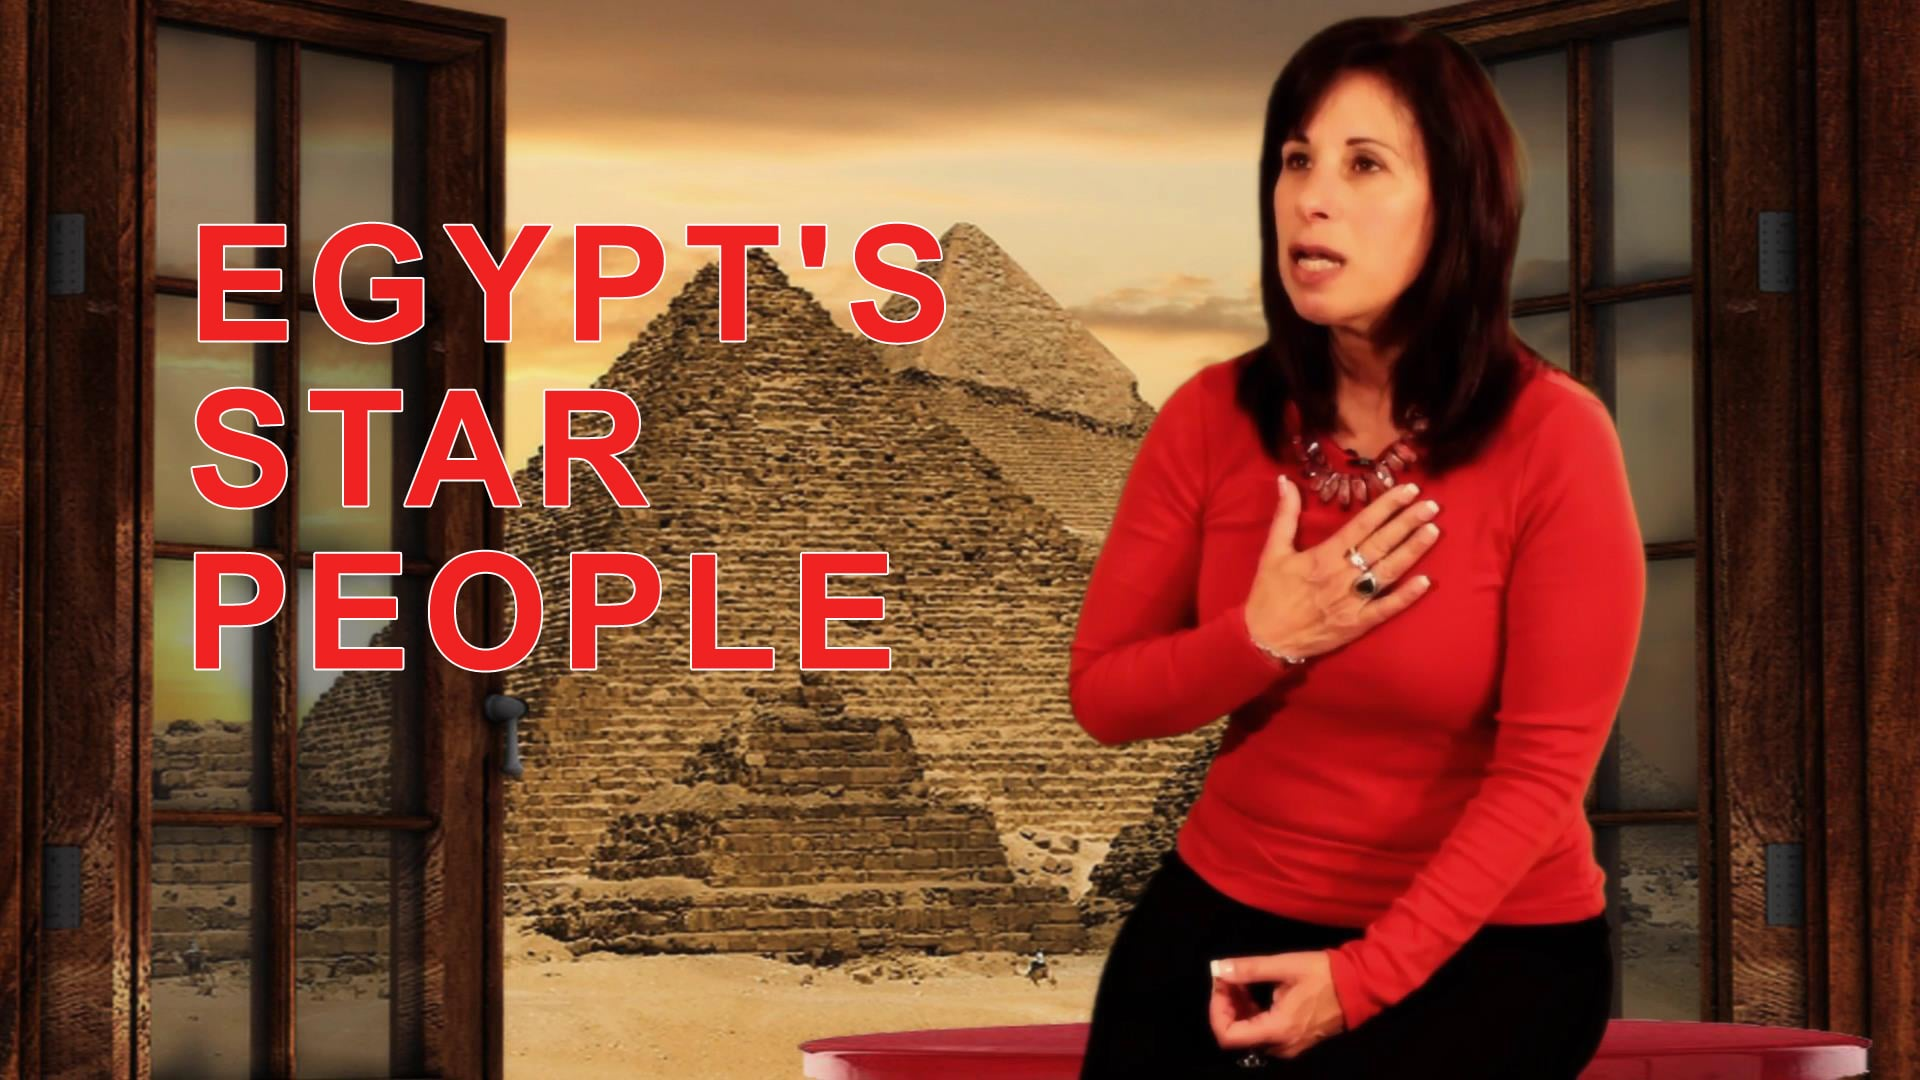 Egypt's Star People